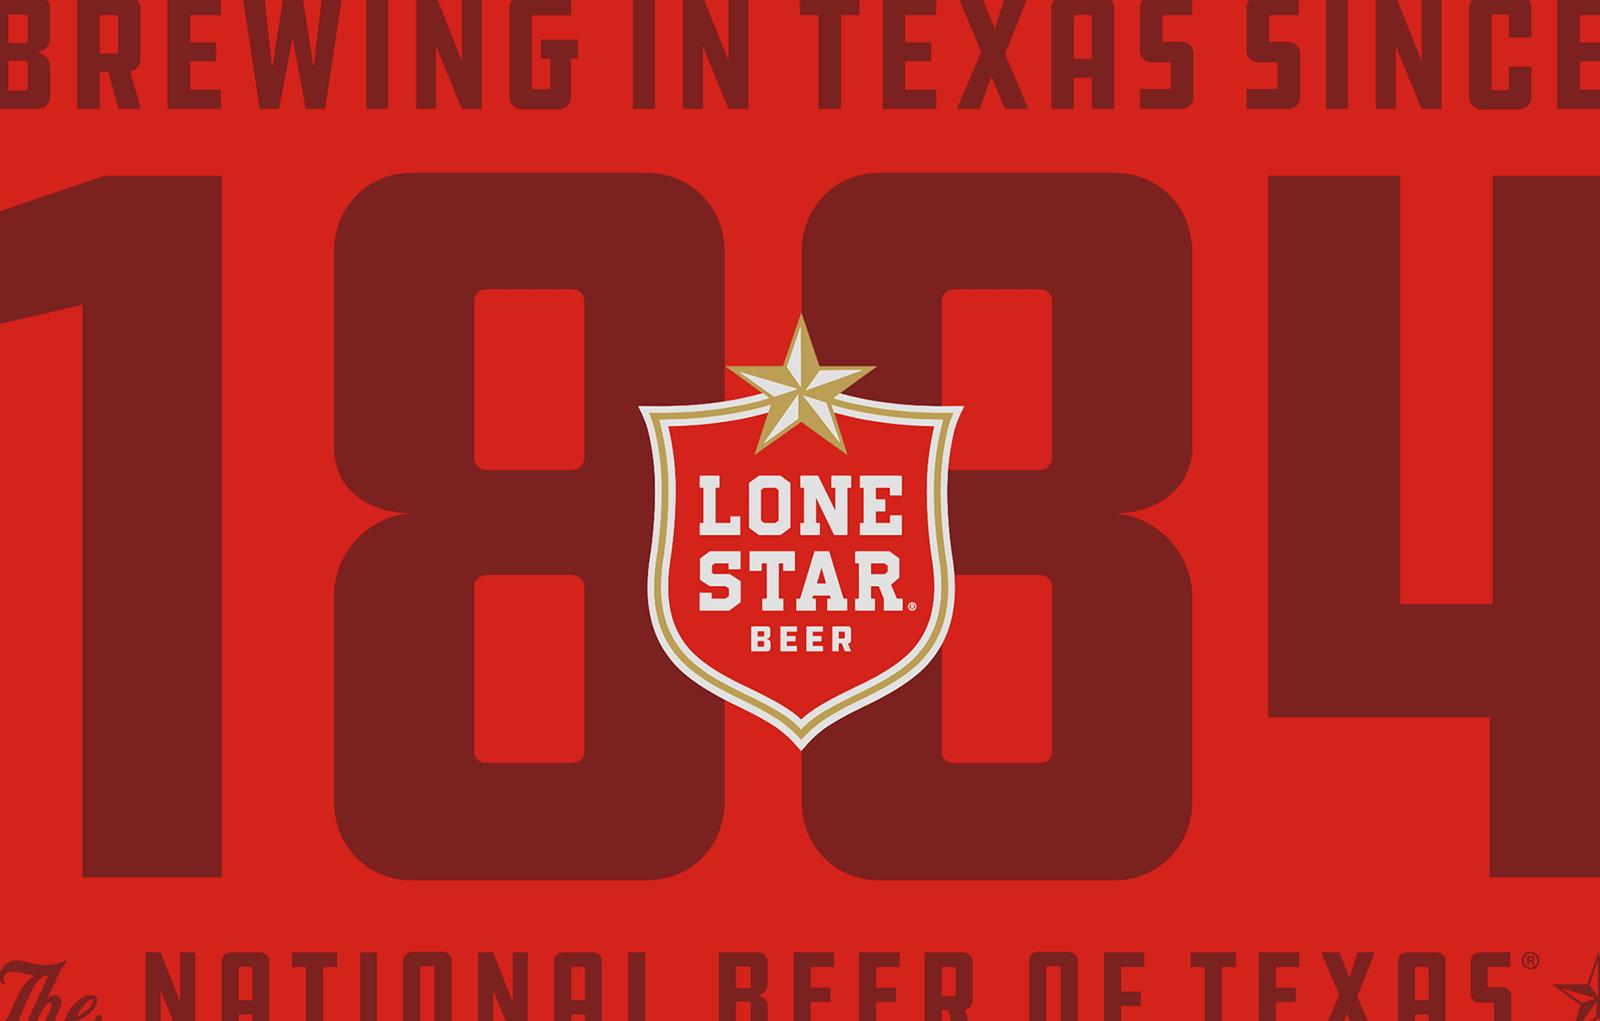 Lone Star孤星啤酒品牌更新全新的品牌VI视觉和包装设计-深圳VI设计3